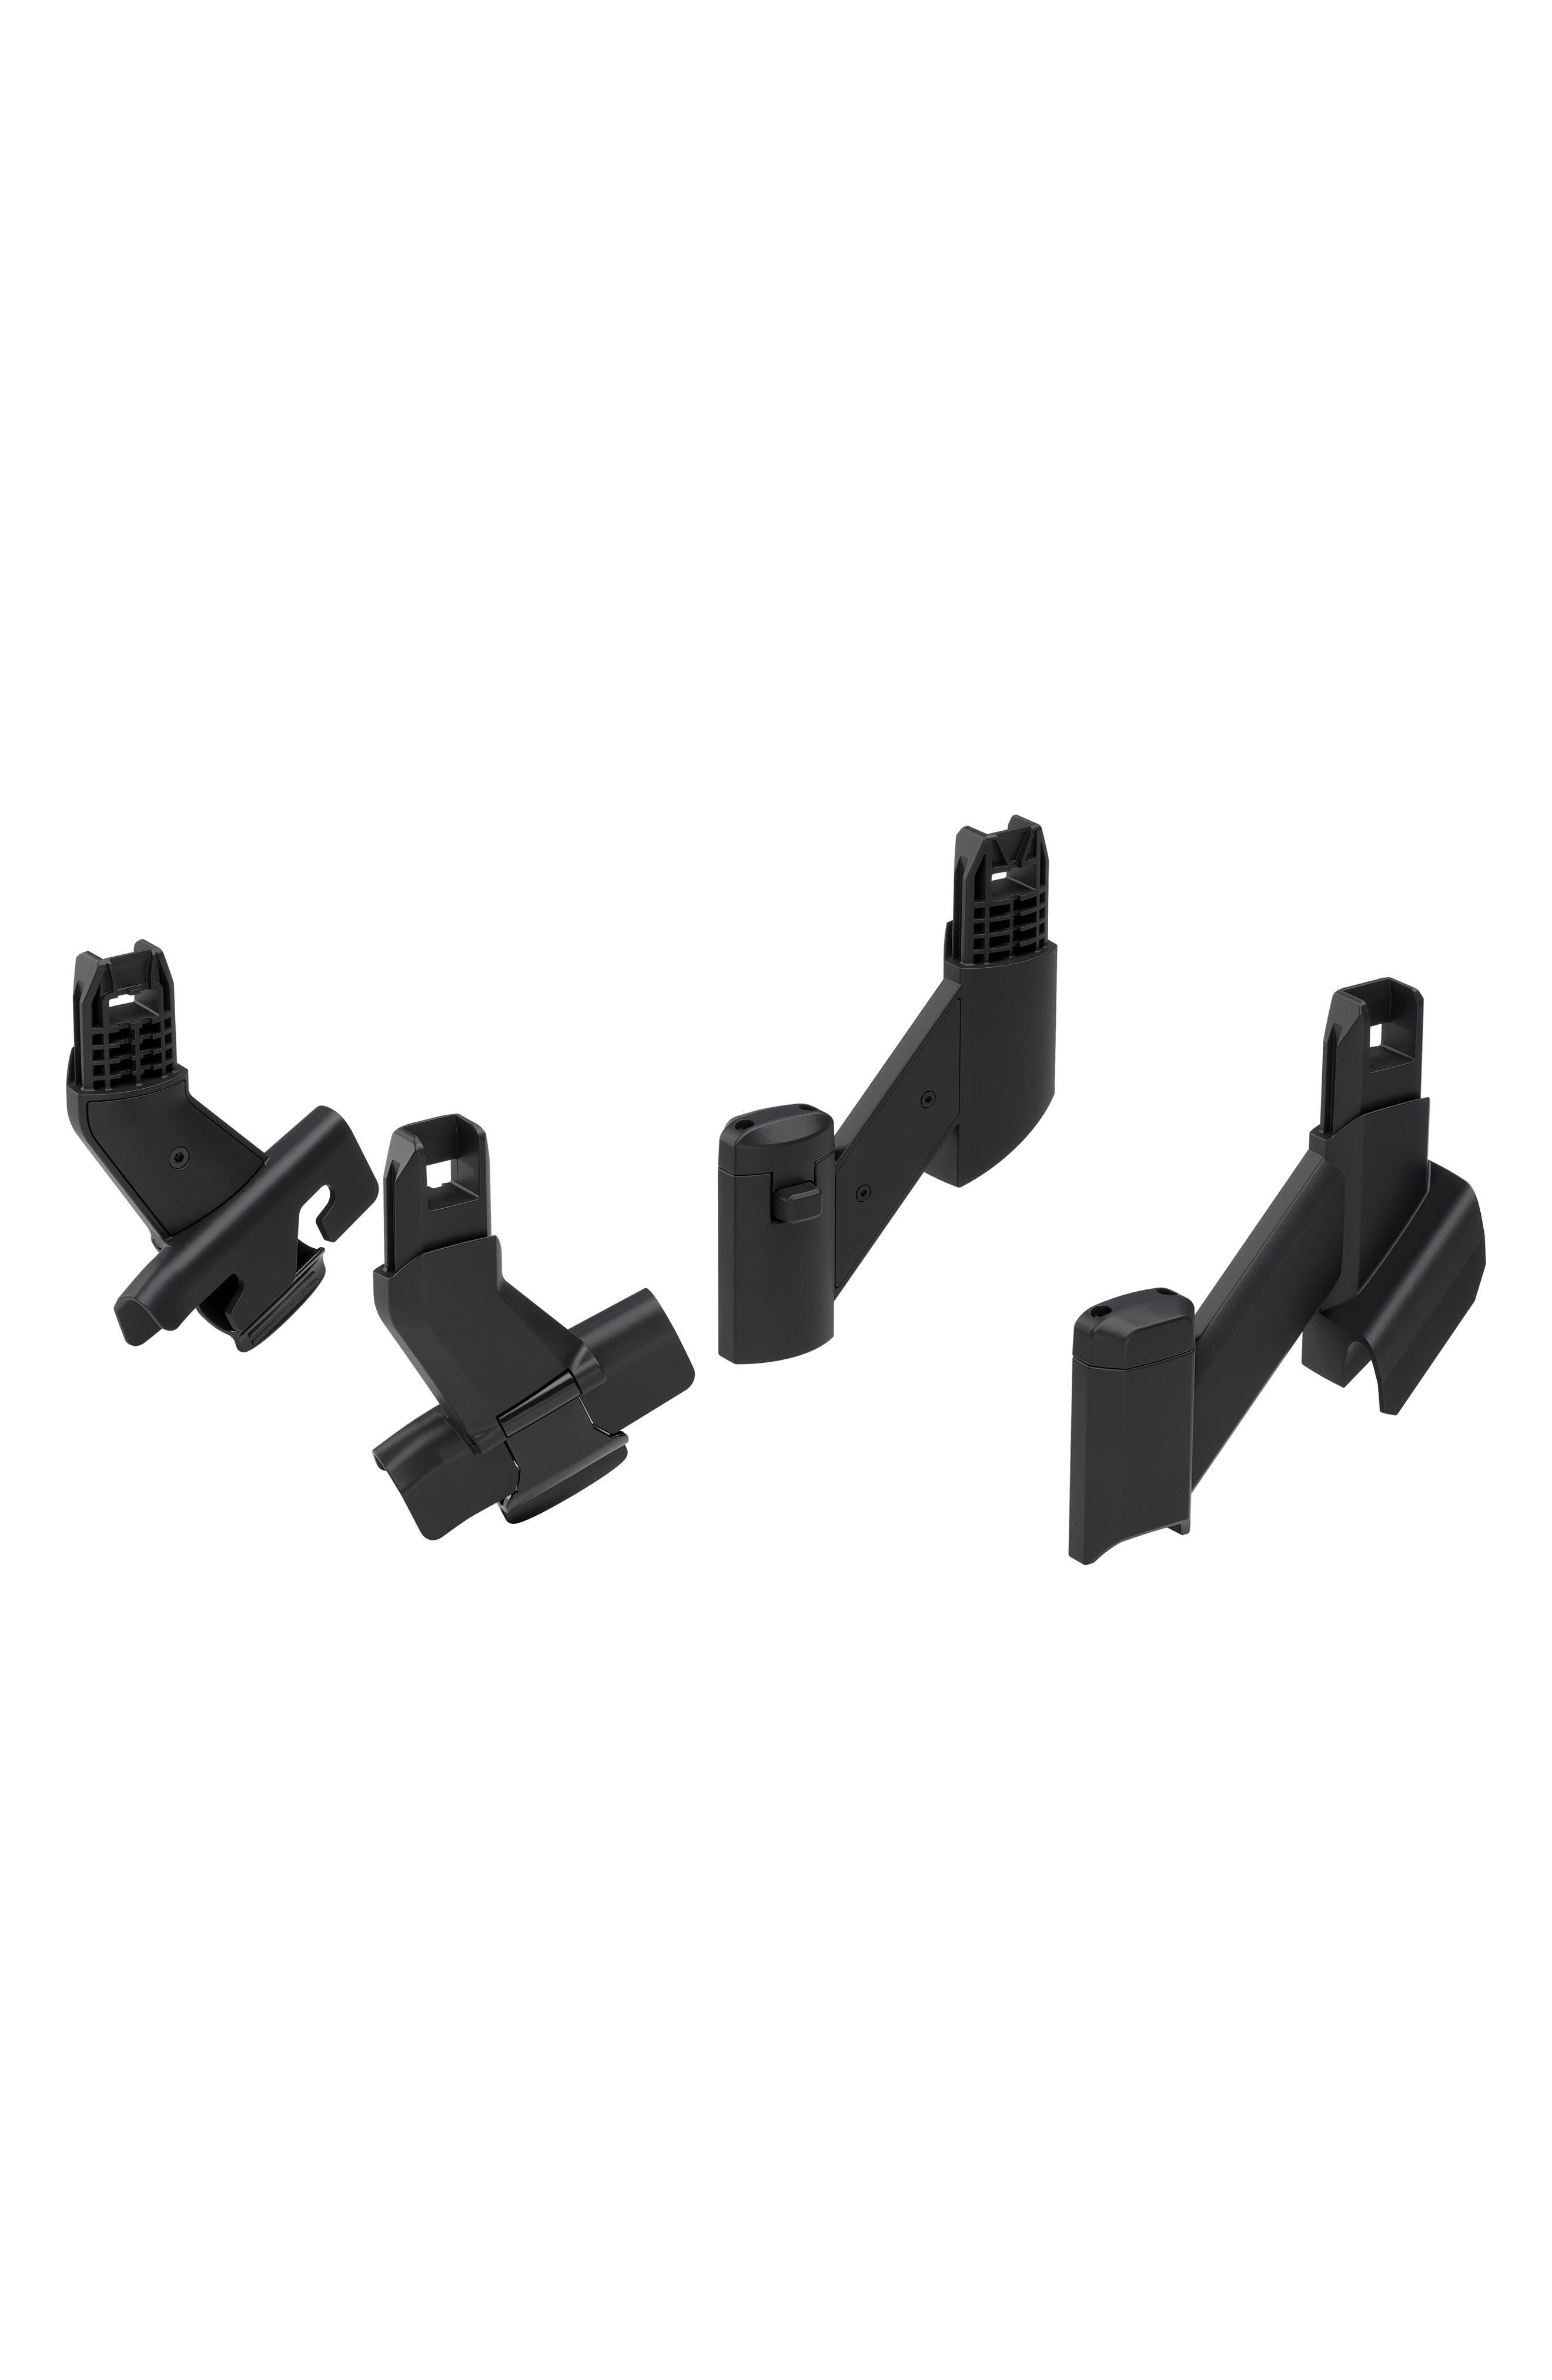 Sleek Sibling Adapter Kit for Thule Sleek Stroller,                             Main thumbnail 1, color,                             BLACK